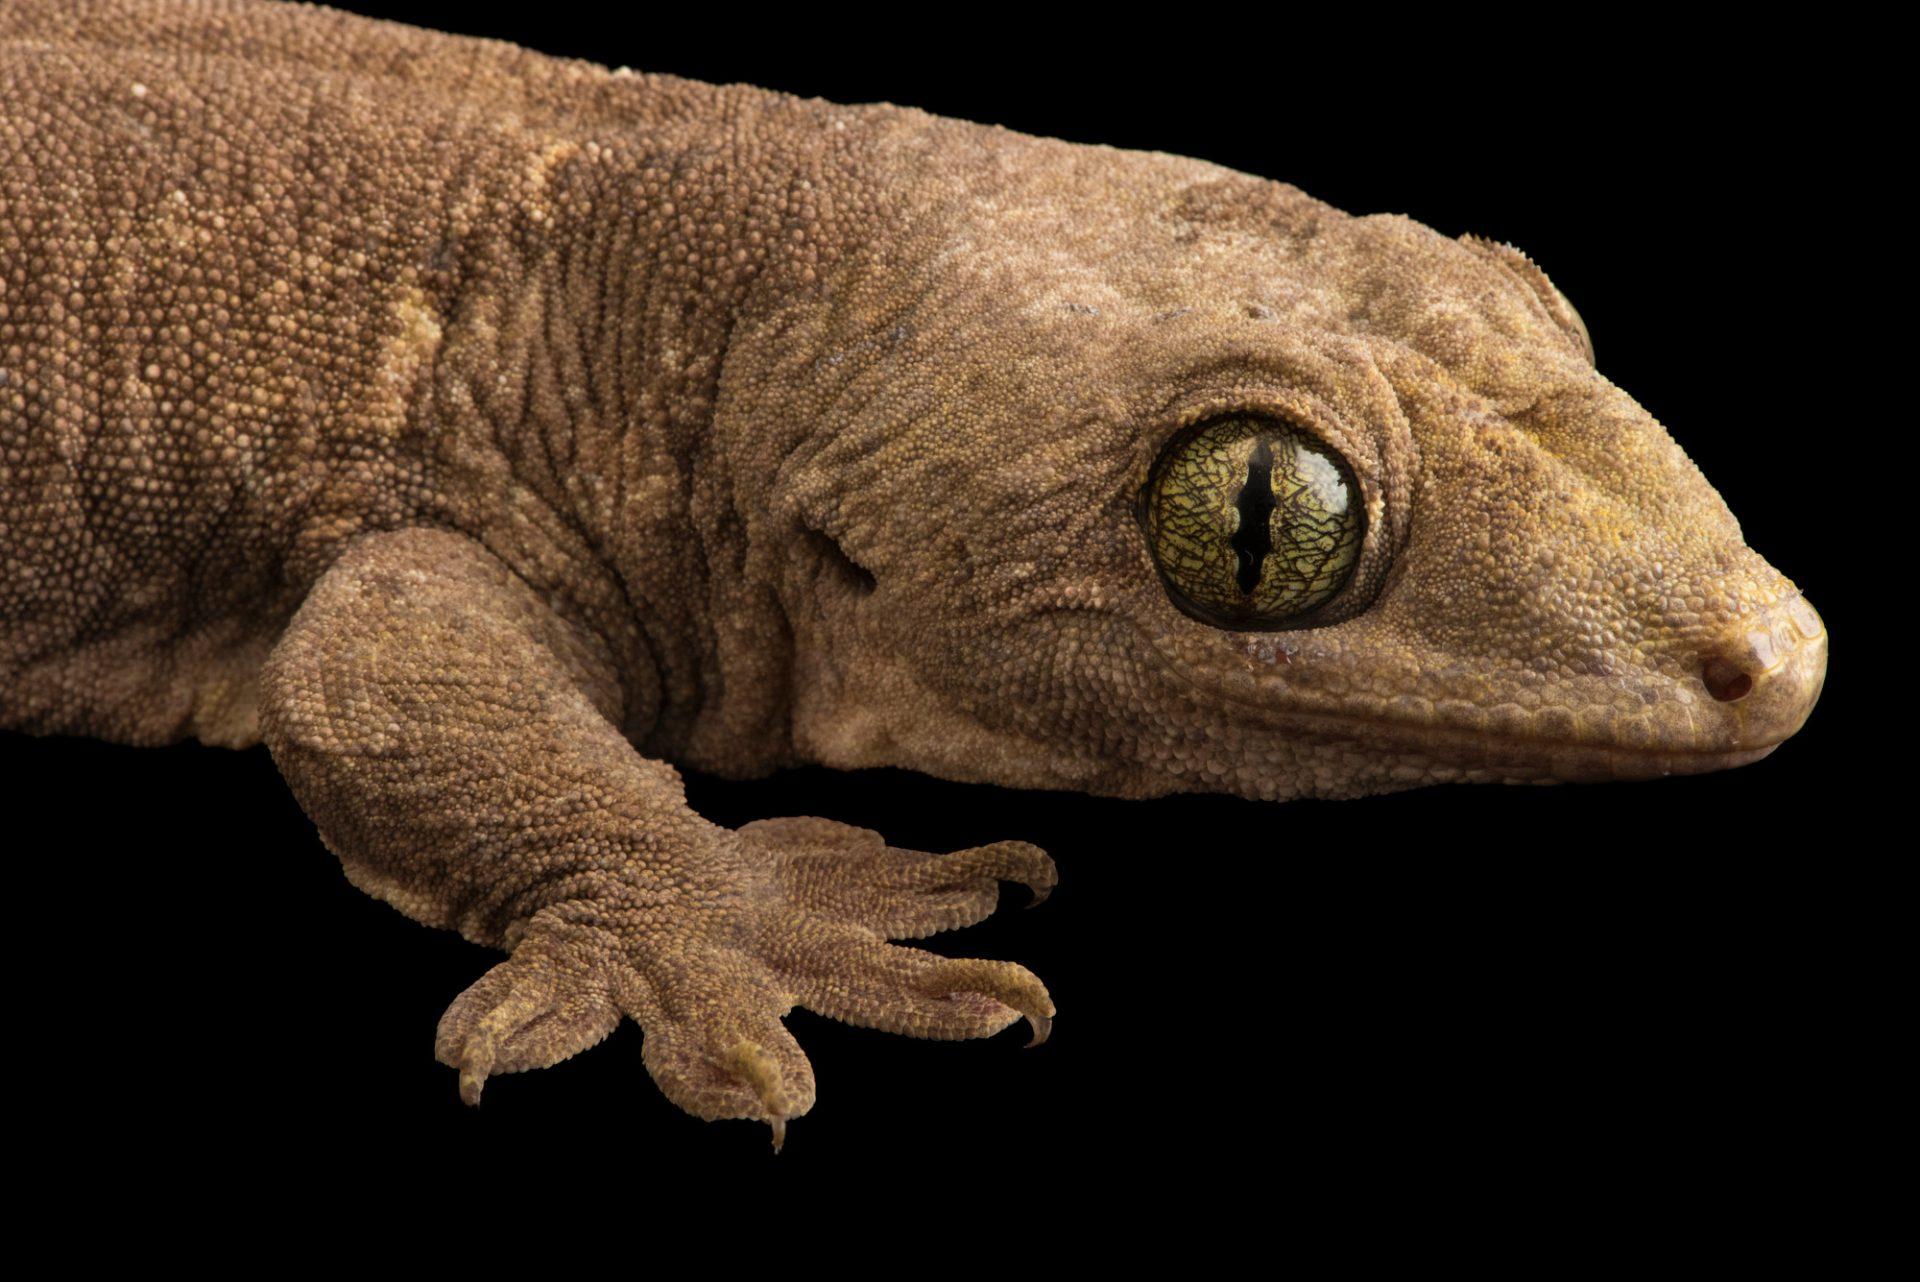 Photo: Halmahera giant gecko (Gehyra marginata) at the Hutchinson Zoo. Stupid obvious.